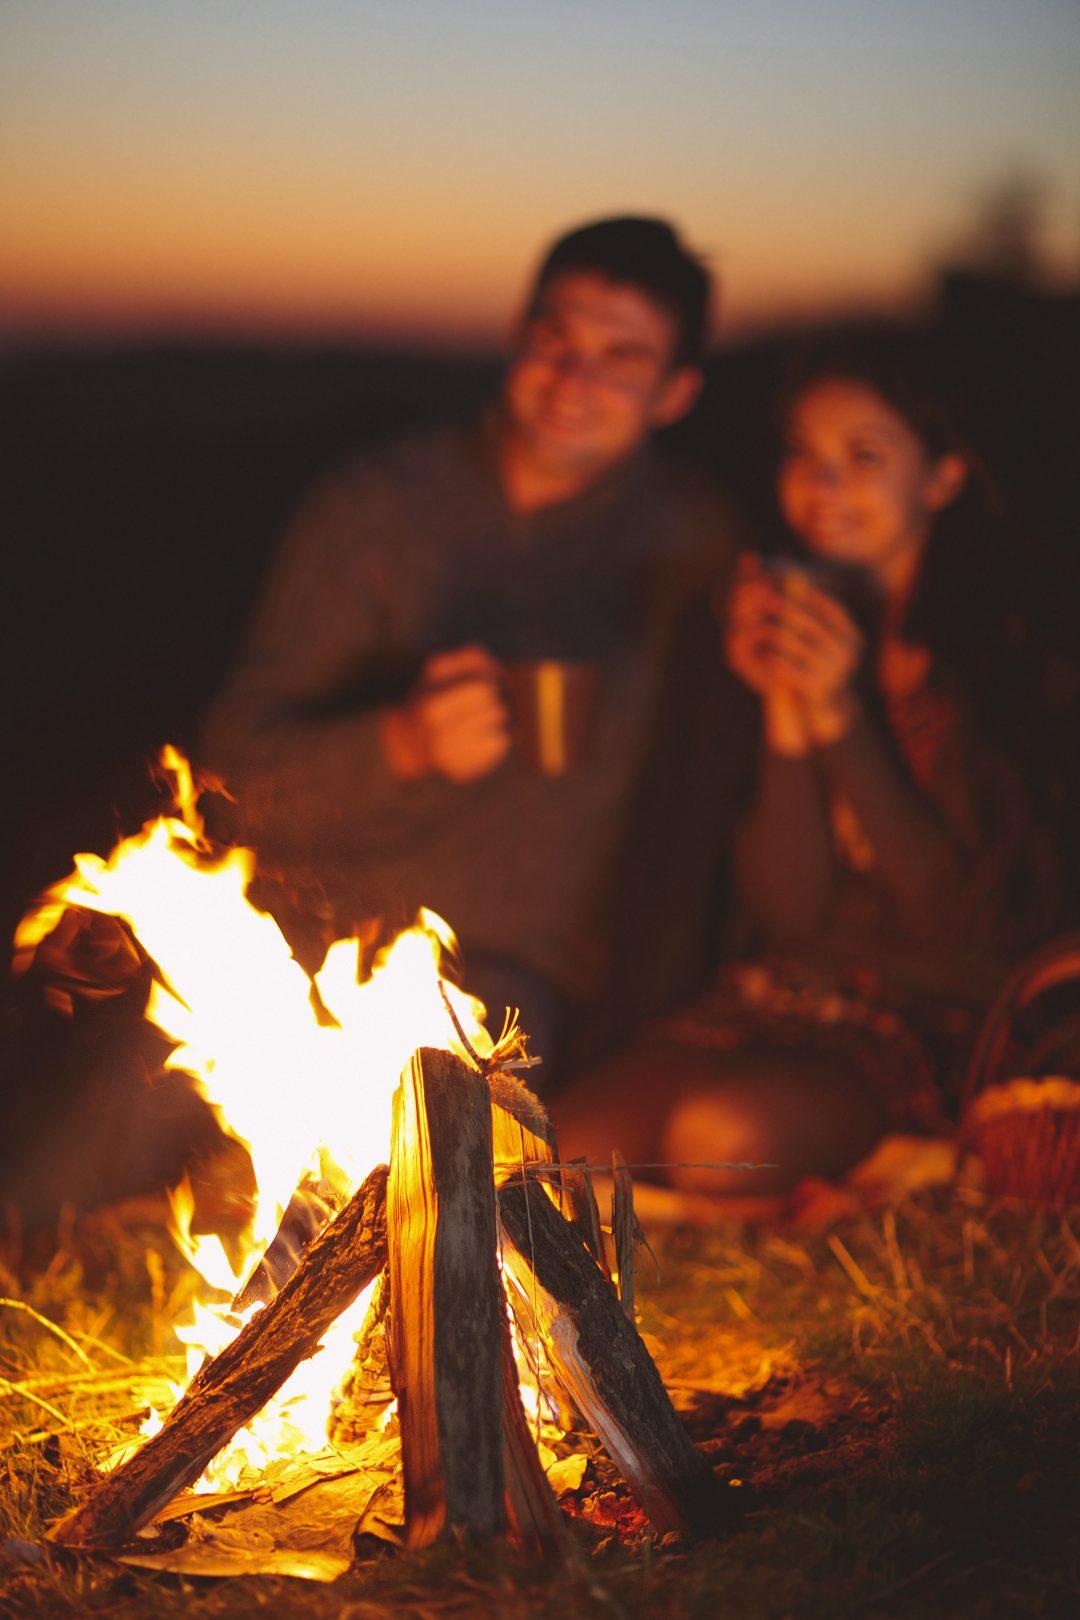 winter-wedding-proposal-ideas-bonfire-on-the-beach